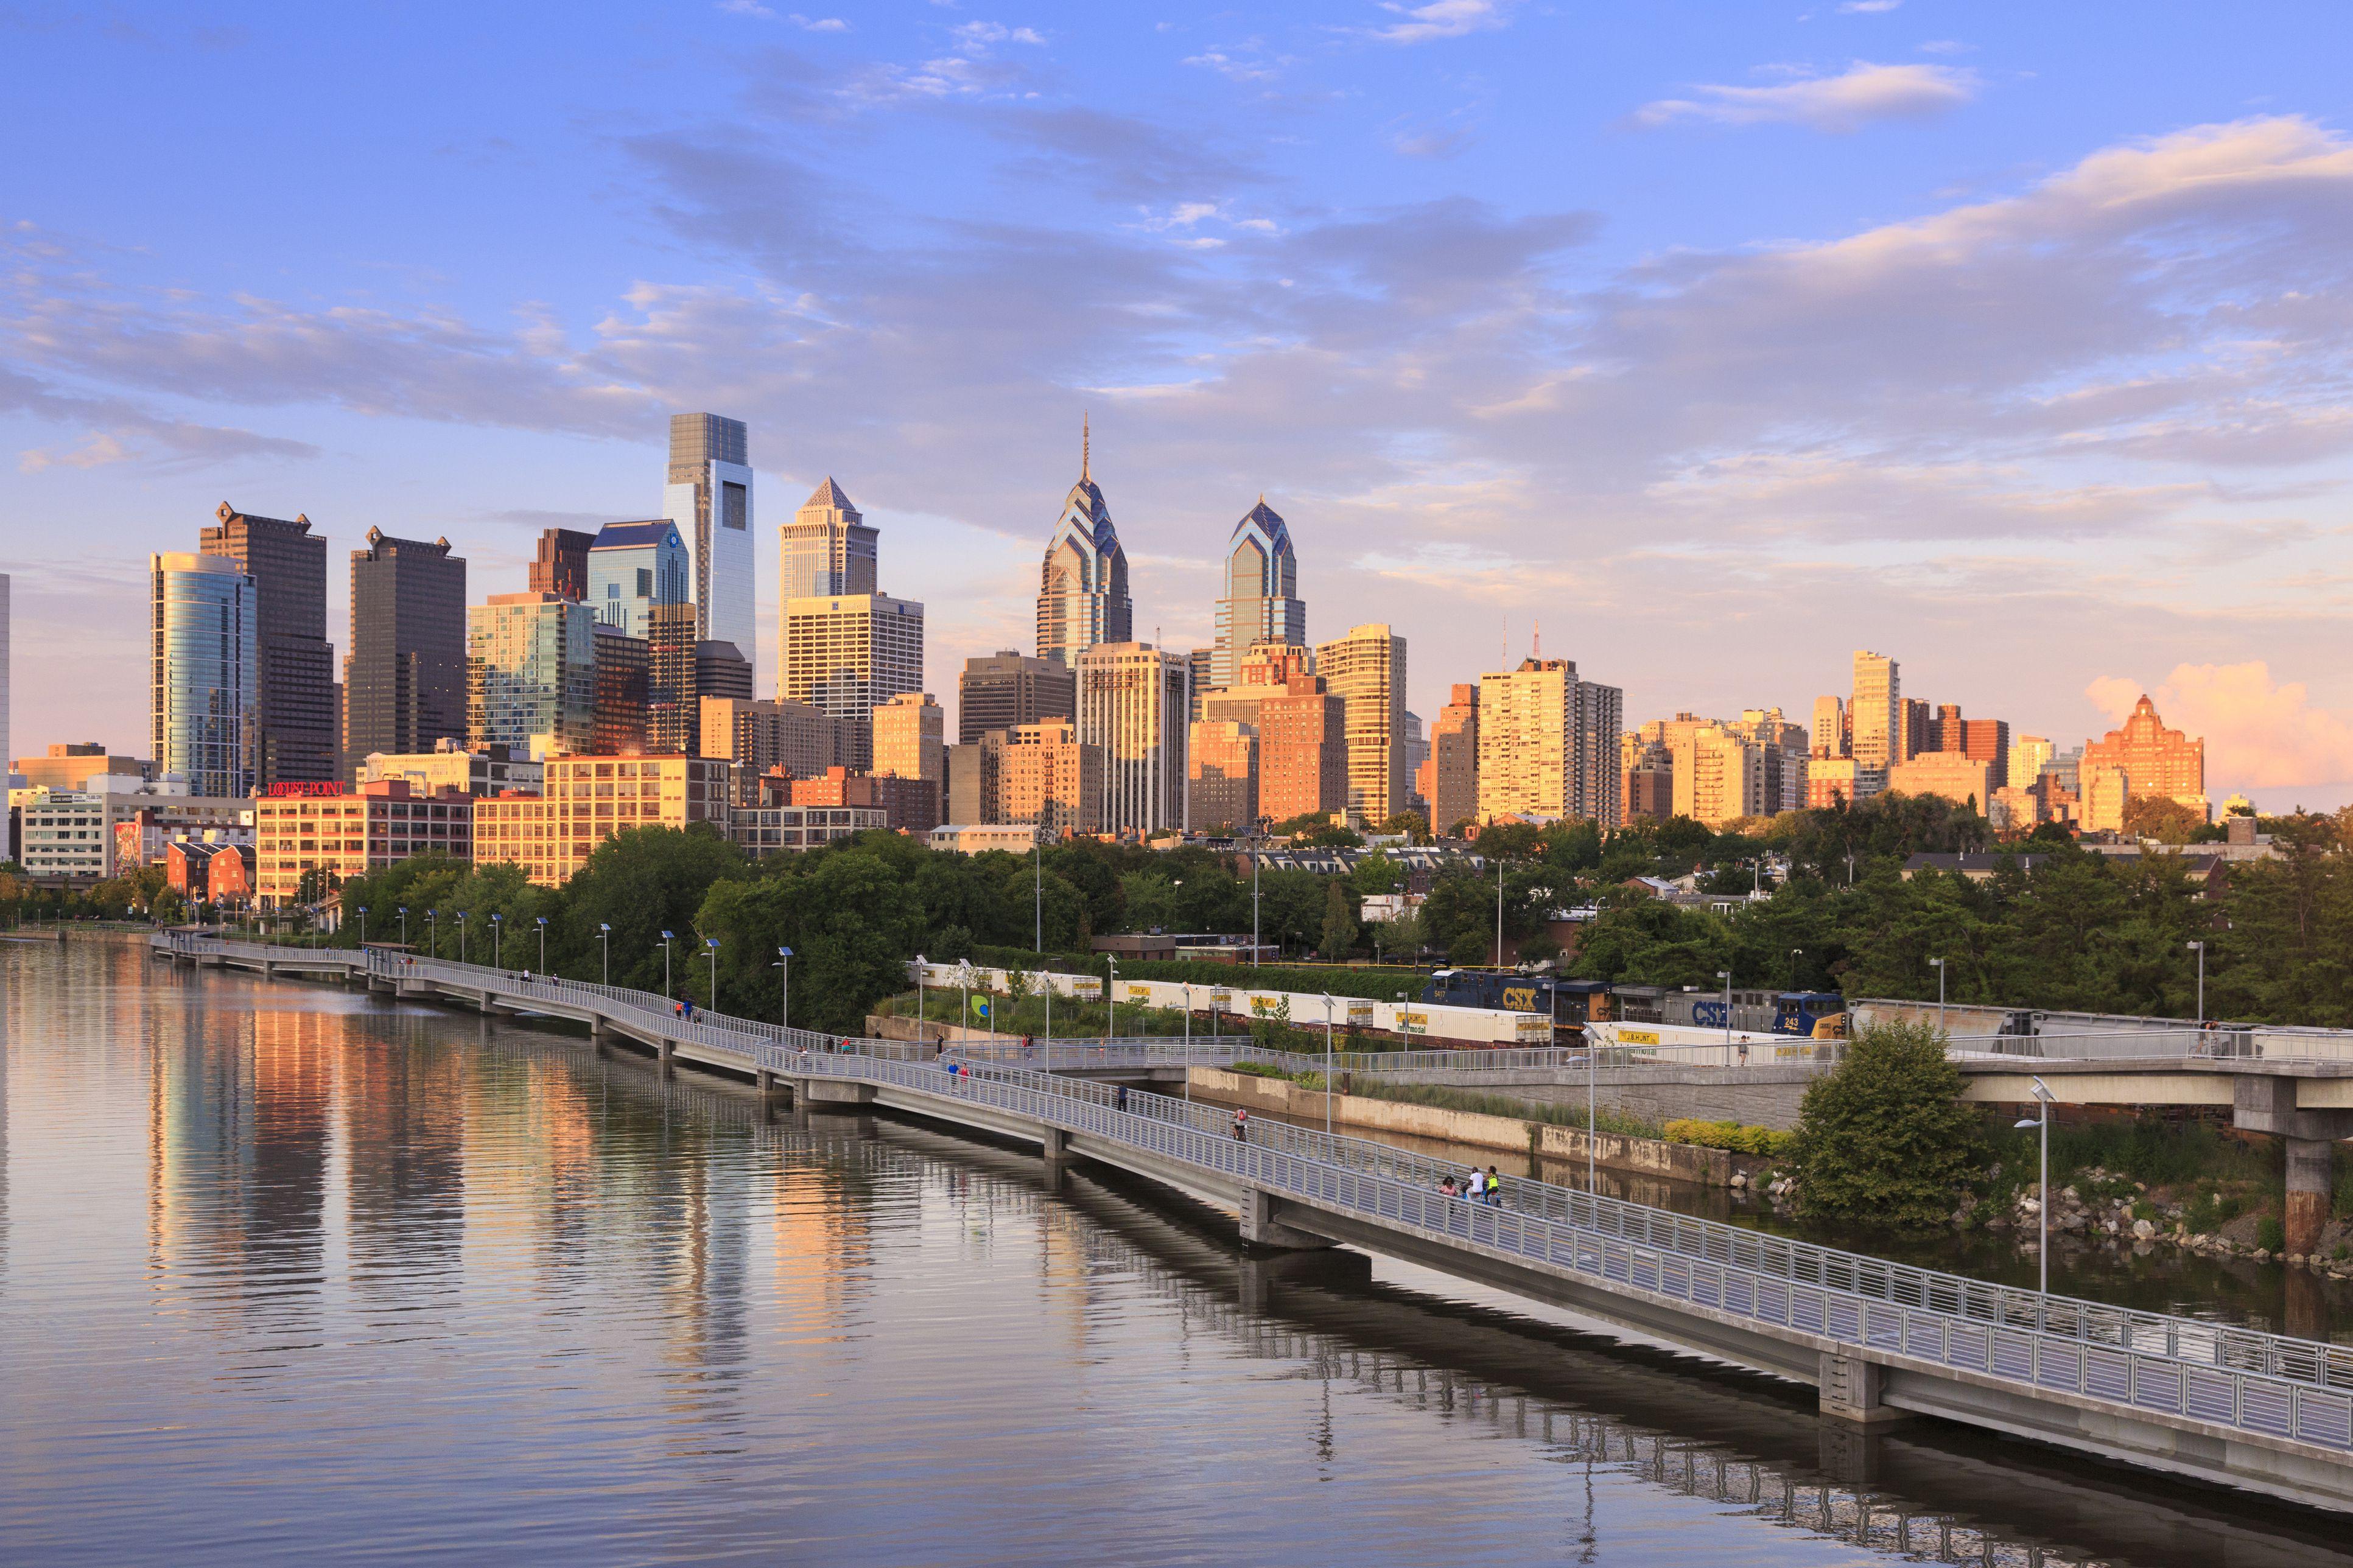 Philadelphia skyline with Schuylkill River